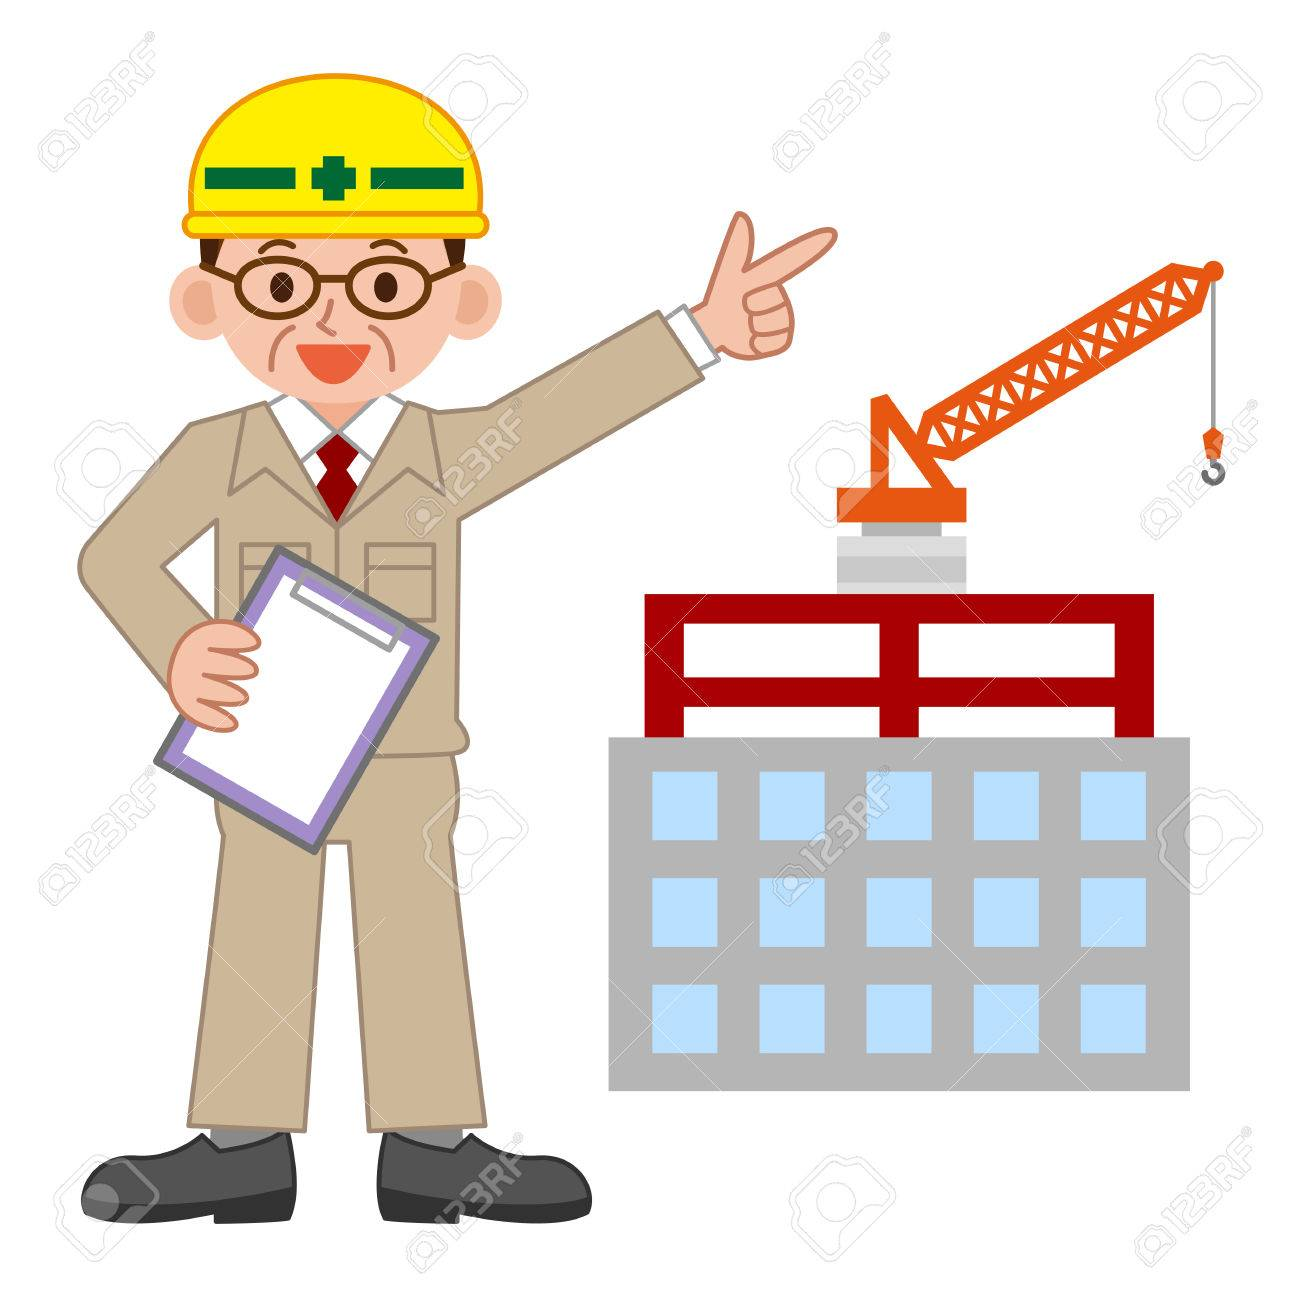 Illustration of Site supervisor - 63209341